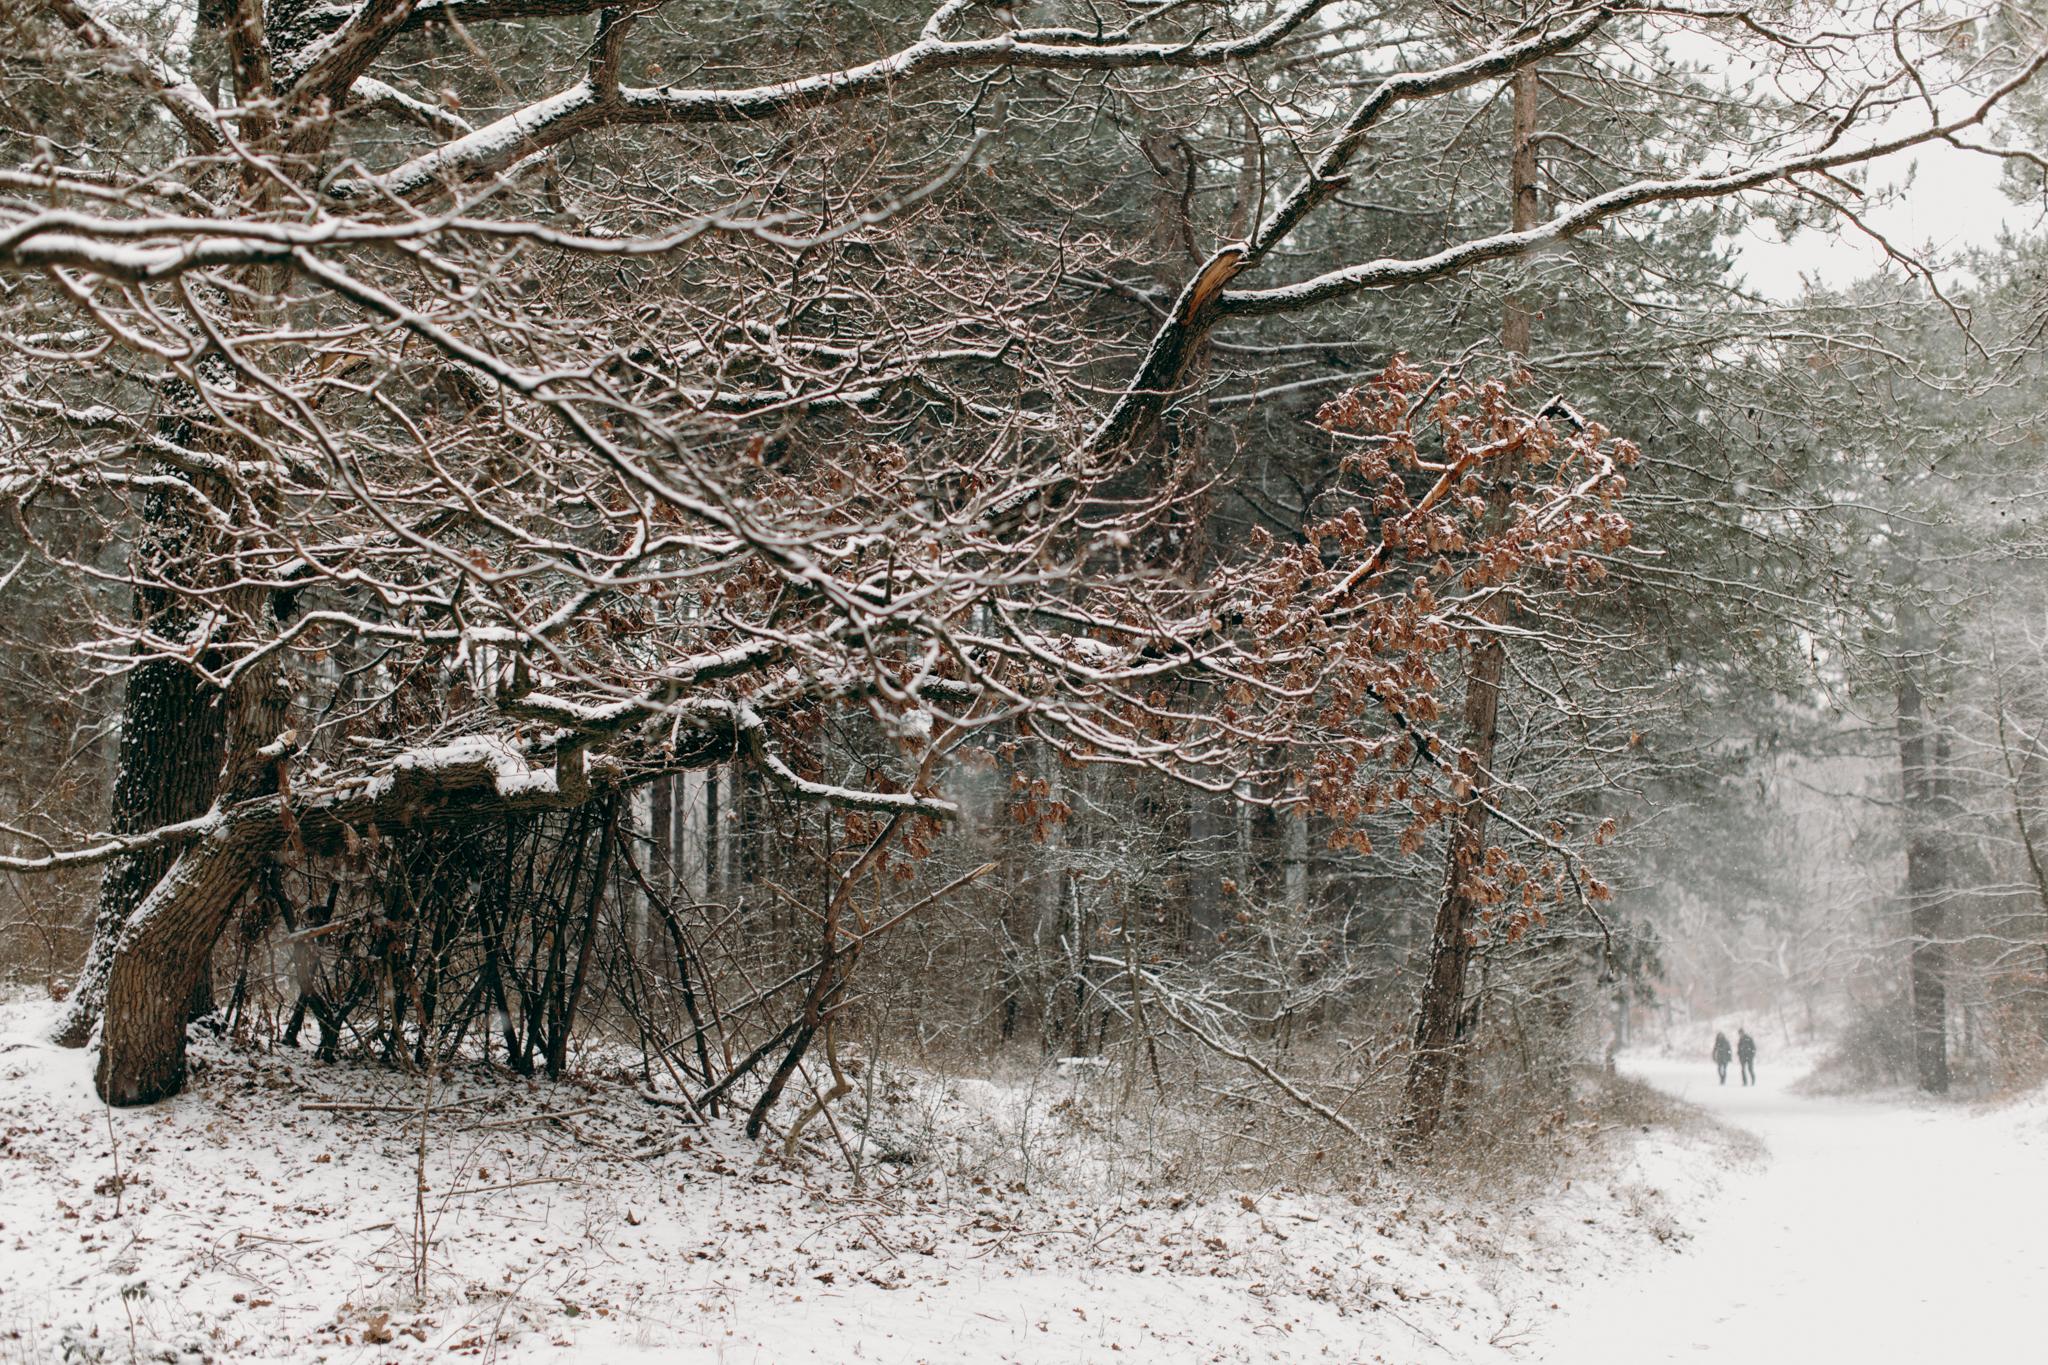 033-winter-sneeuw-oosterplas-bloemendaal.jpg